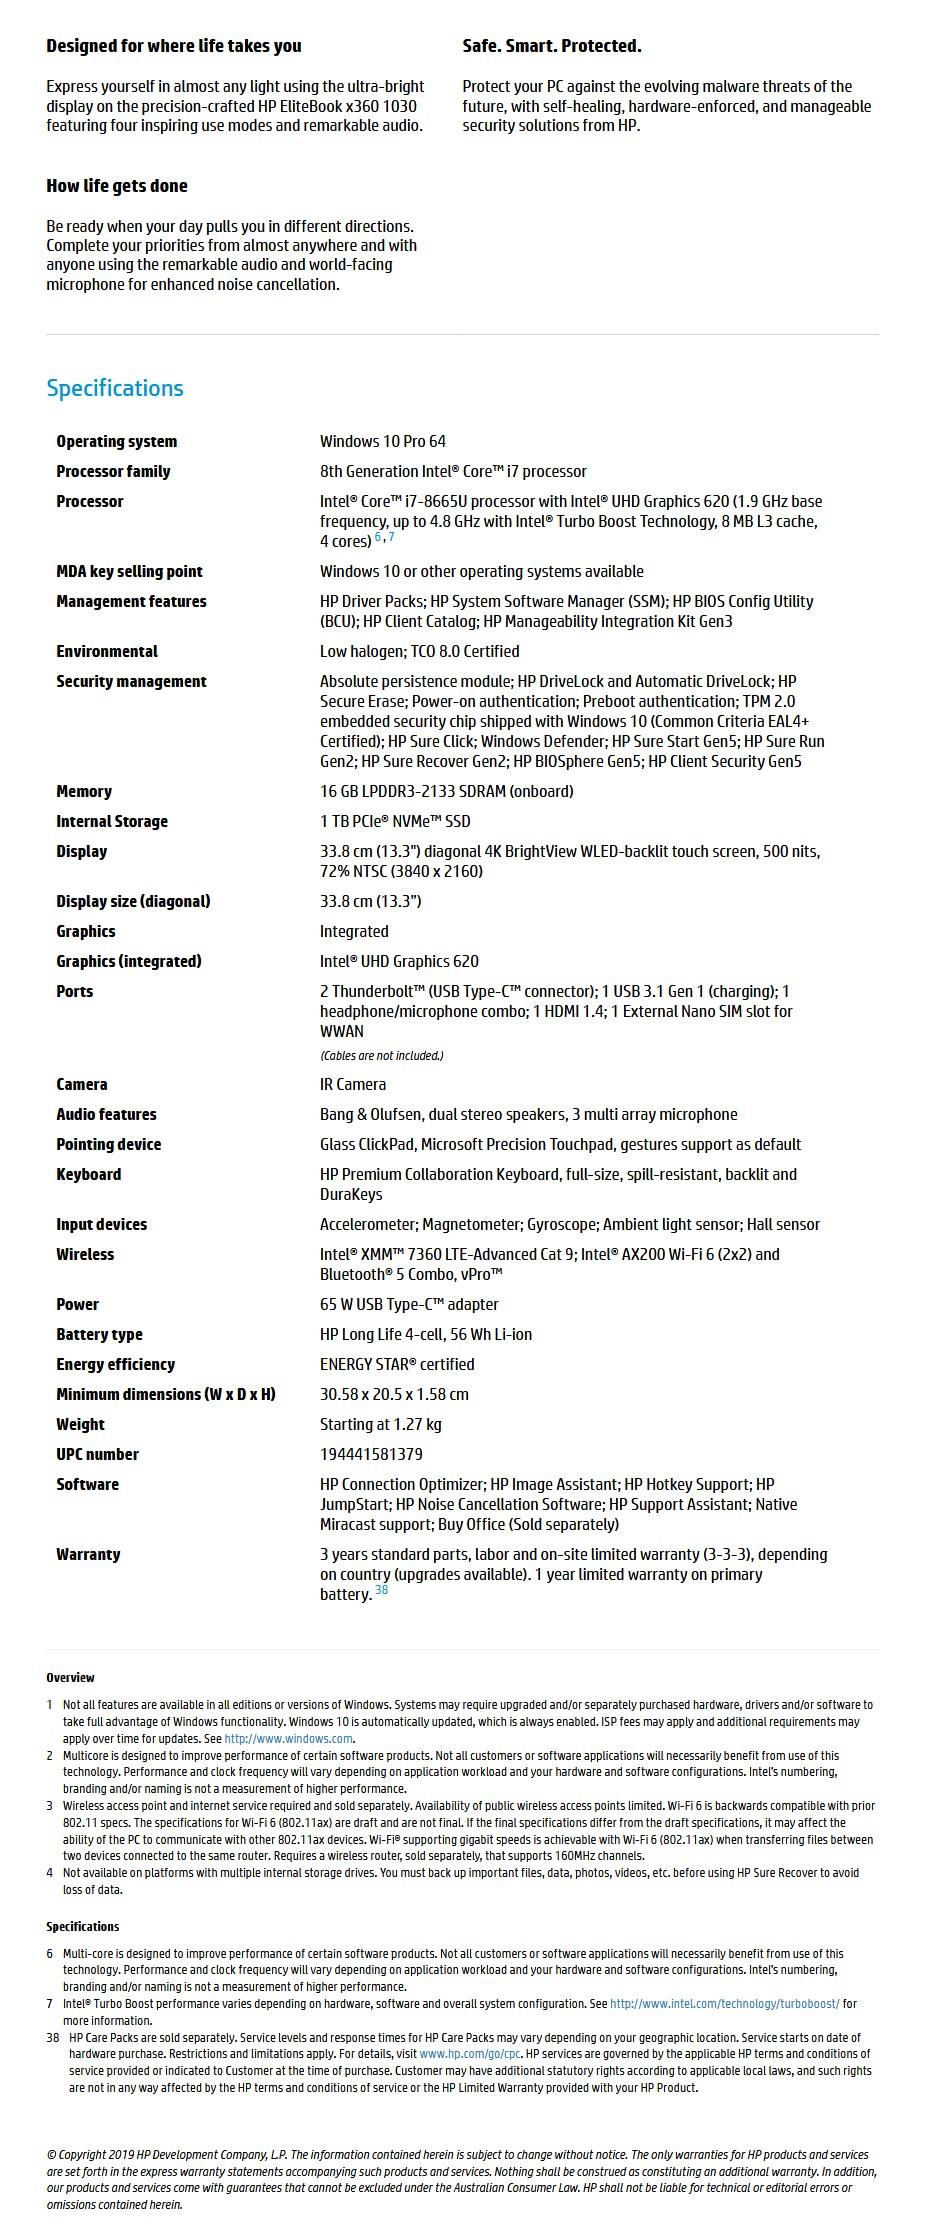 "HP EliteBook x360 1030 G4 13.3"" 4K Laptop i7-8665U 16GB 1TB W10P Touch - Overview 1"